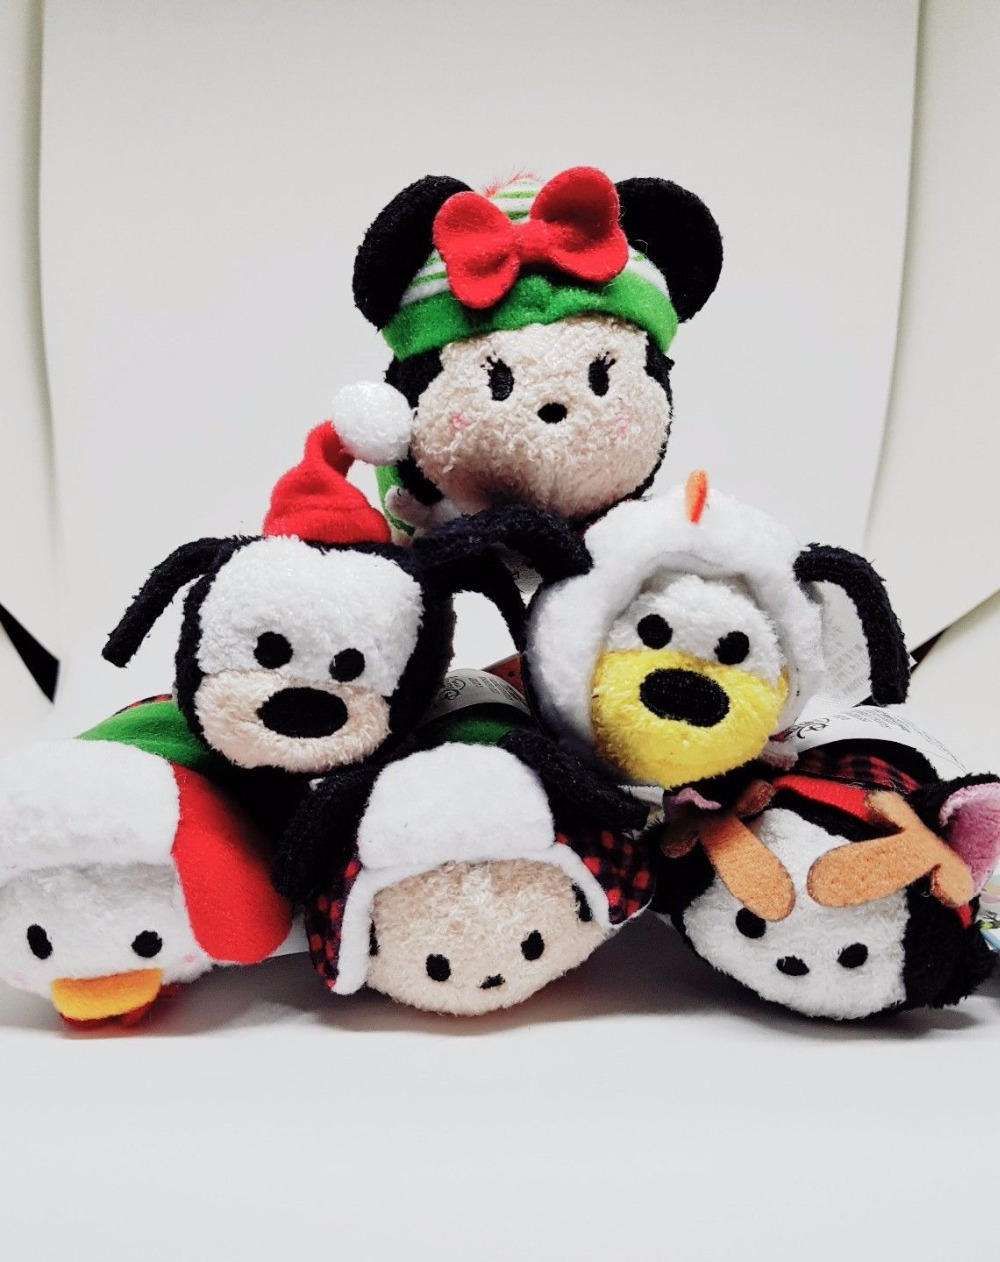 Confiado Tsum Mini Peluche De Juguete De Navidad Mickey Minne Daisy Pato Donald Figaro Gato Goofy Pluto Perro Lindo Limpiador De Pantalla Kplush De Juguete De Regalo